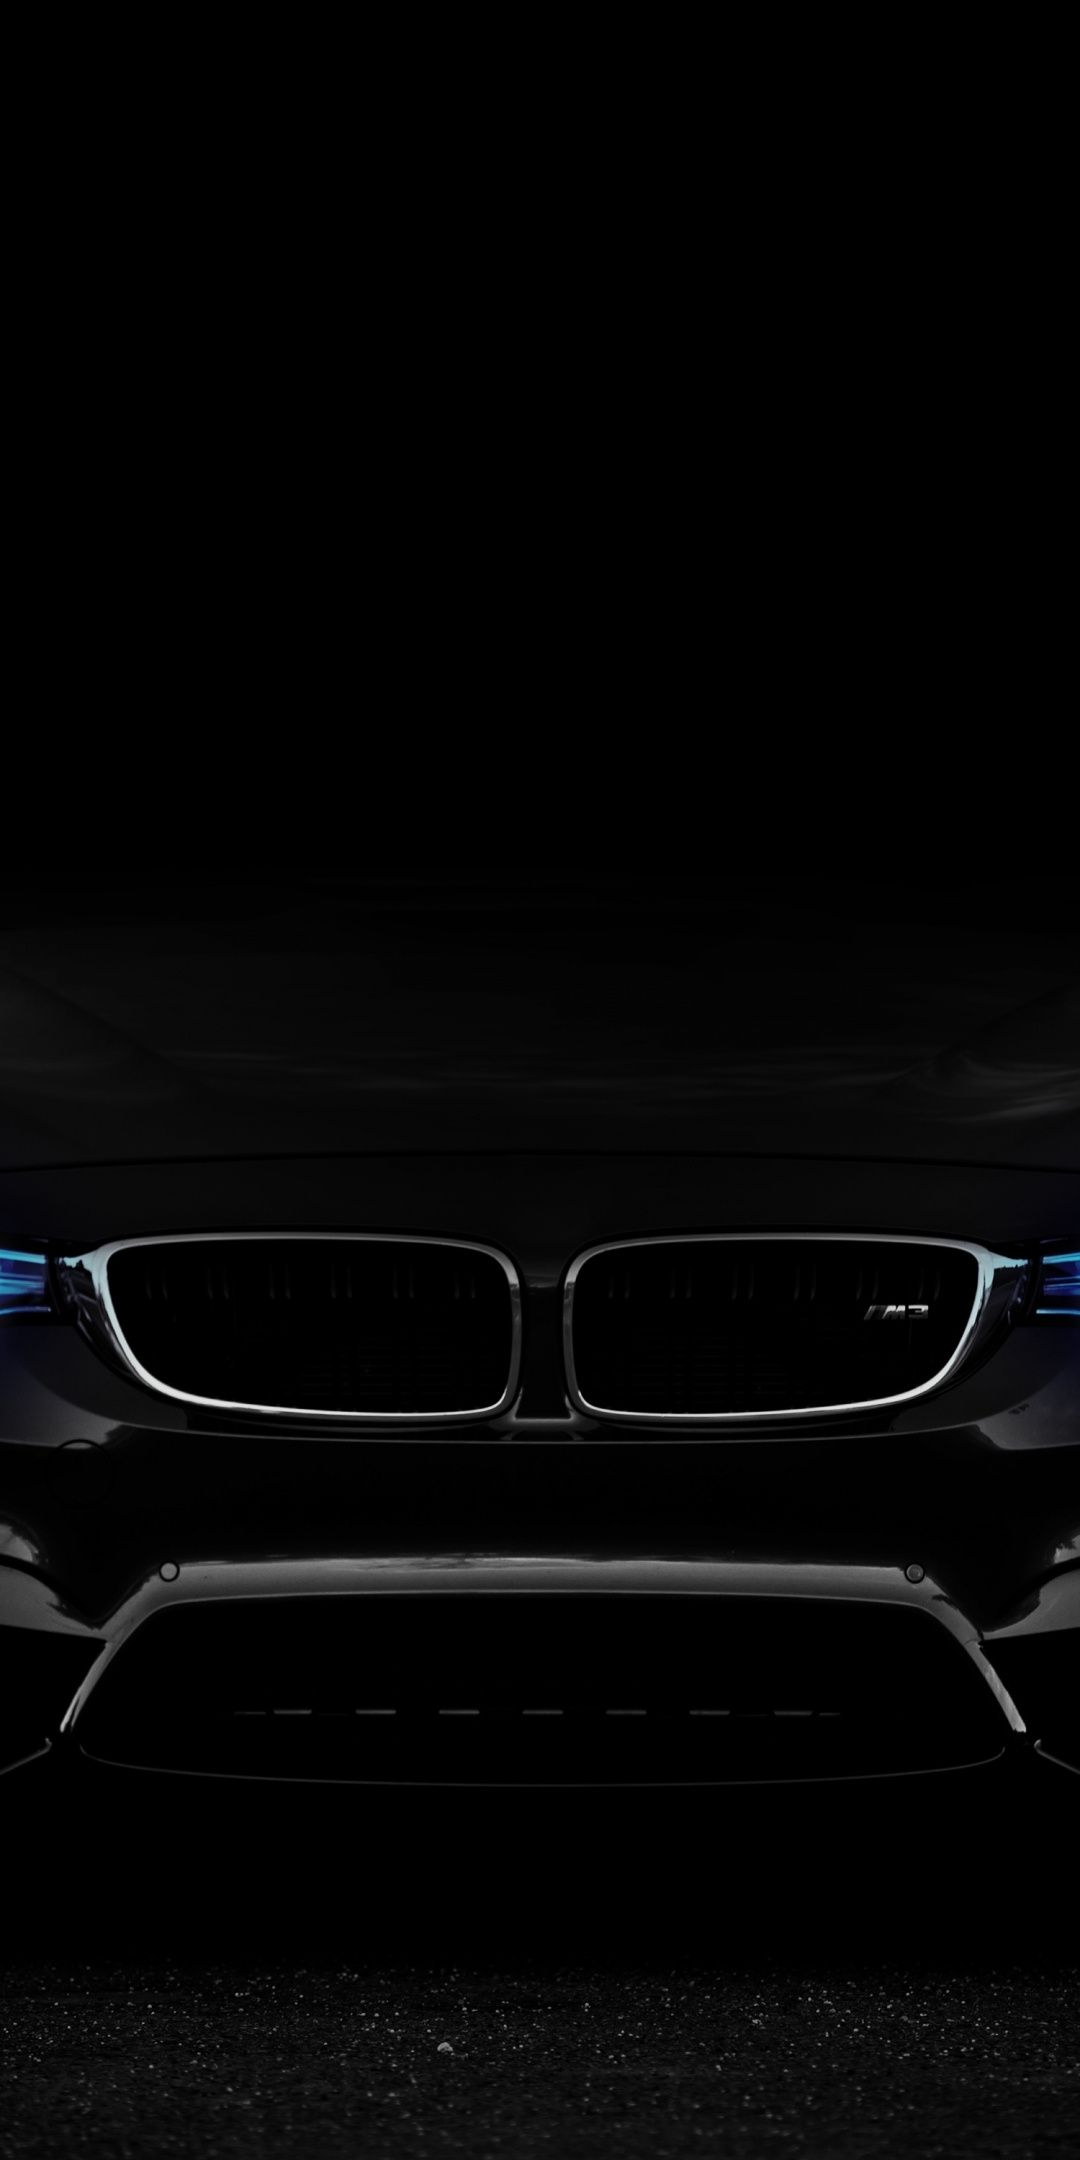 Bmw Car Blue Headlight Dark 1080x2160 Wallpaper Blue Headlights Wallpaper Bmw Bmw